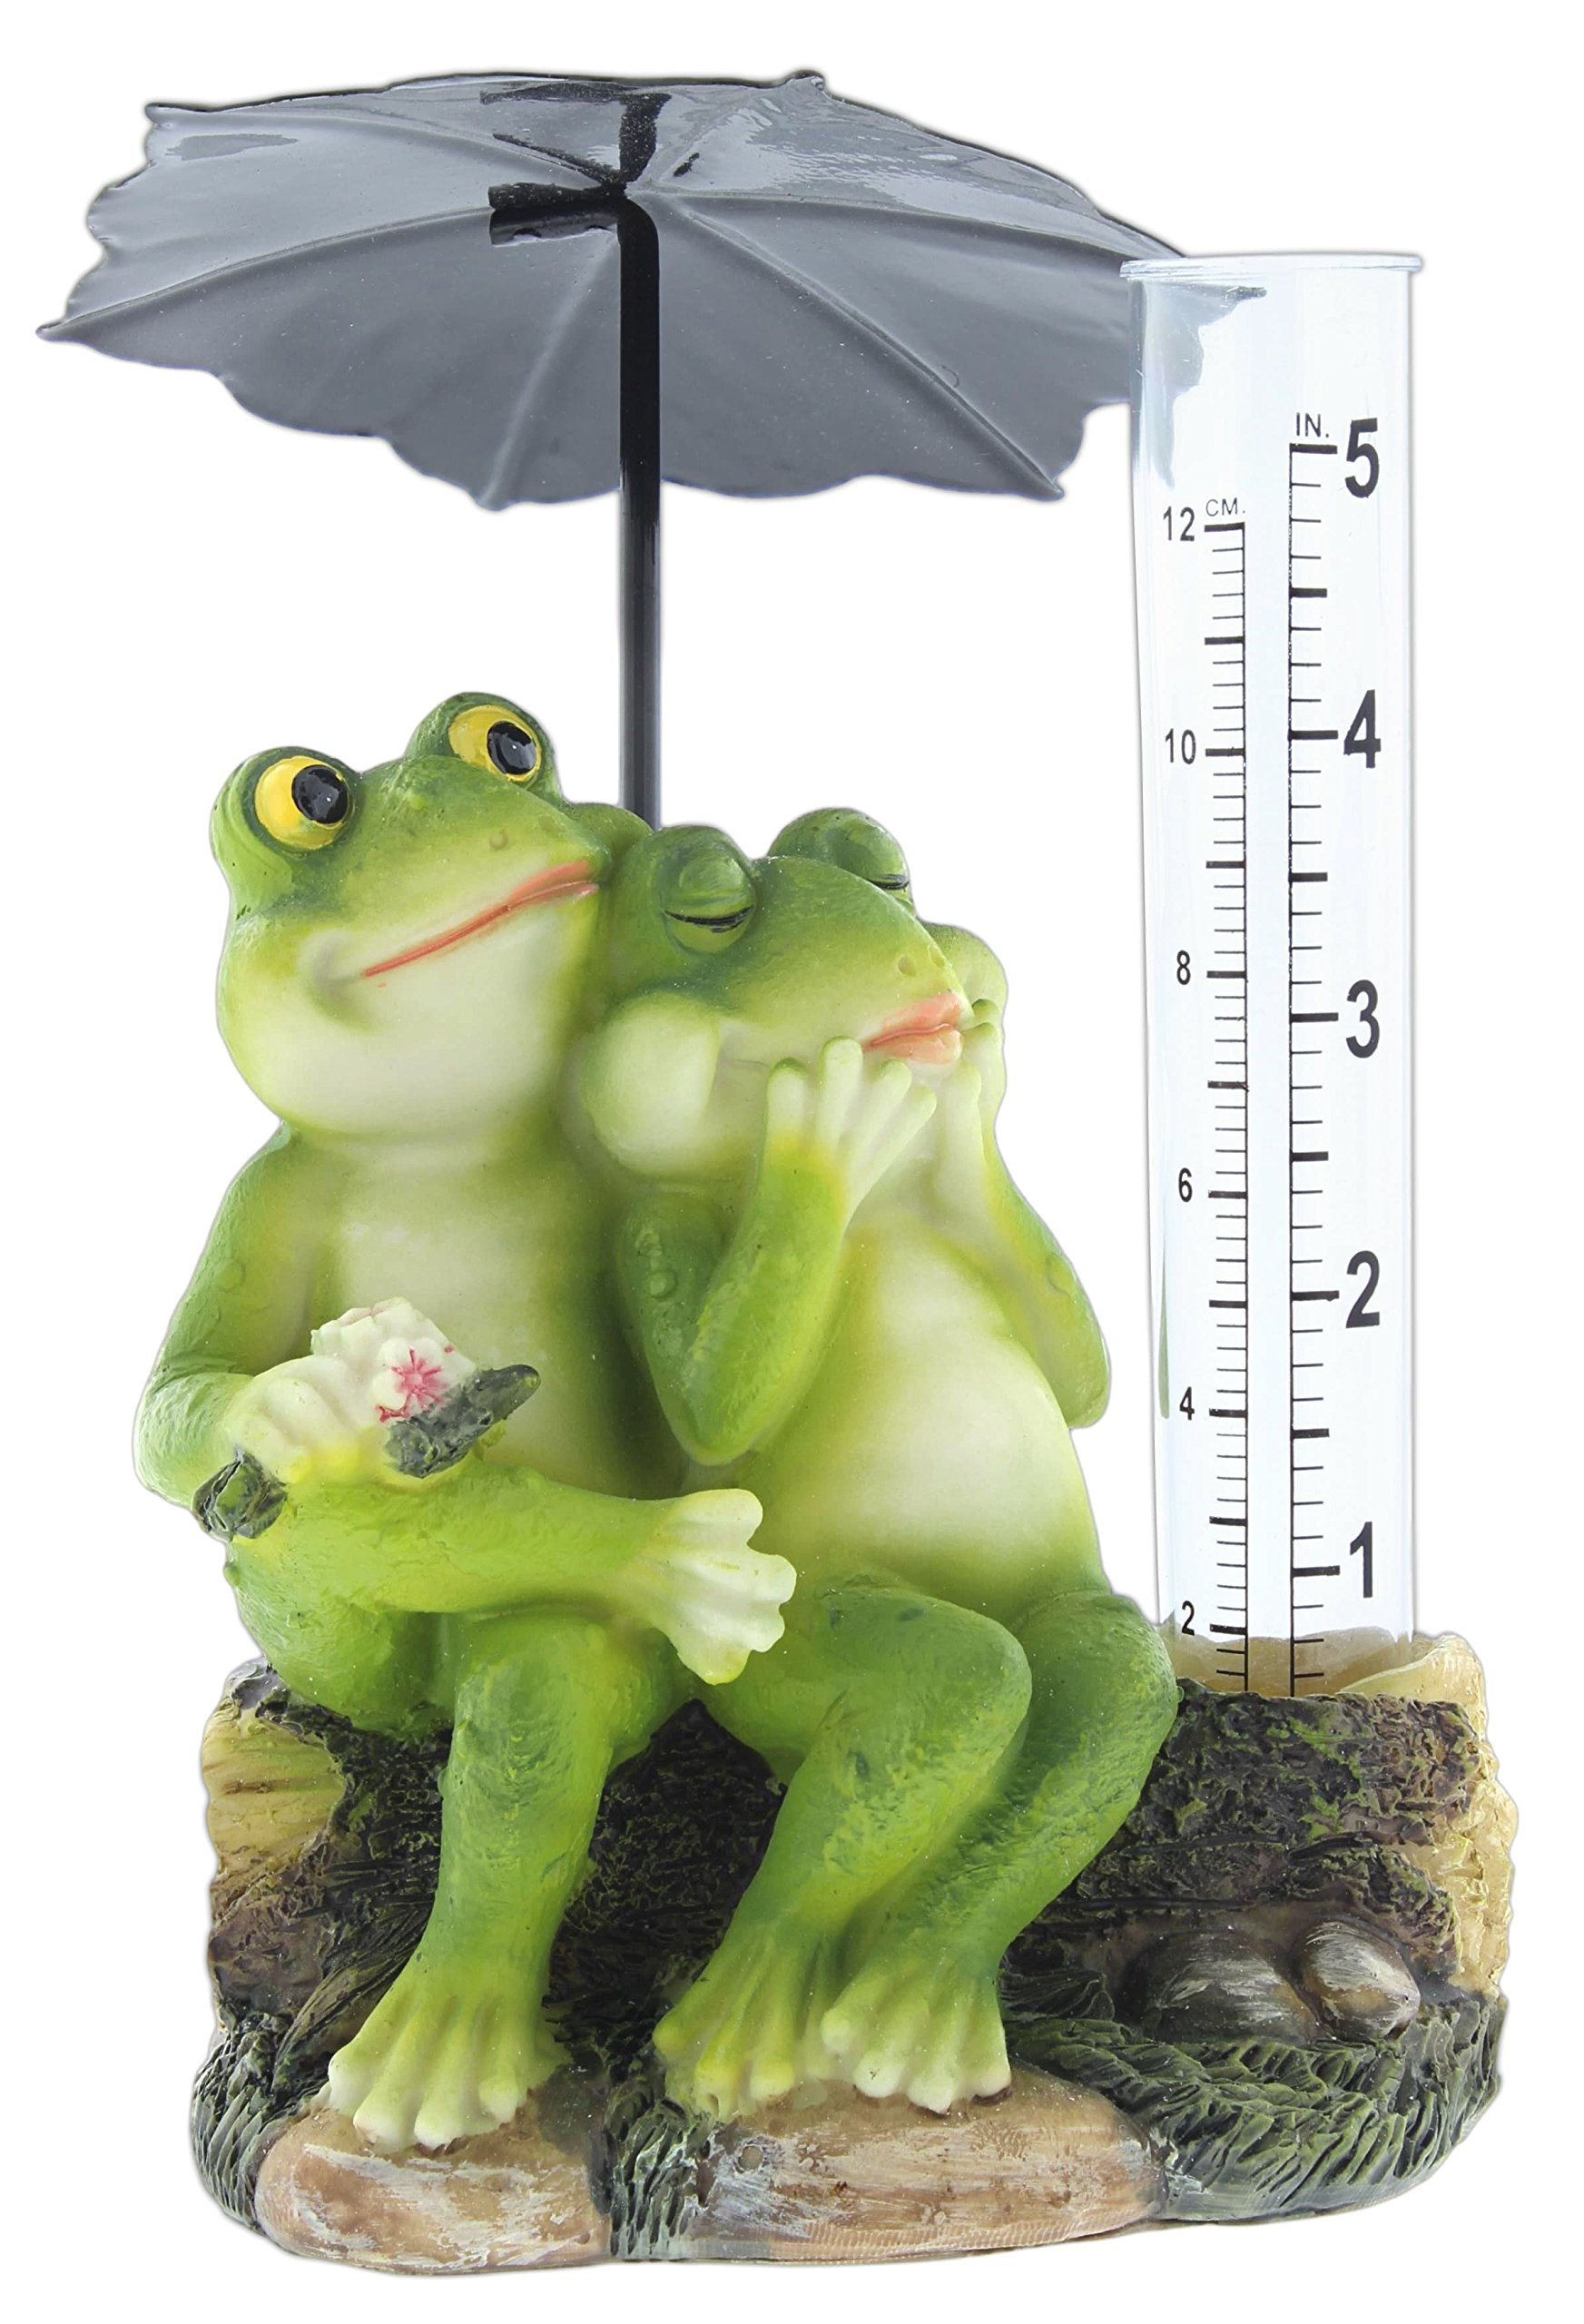 Mayrich 5'' Decorative Rain Gauge Cute Resin Frog Couple with Umbrella